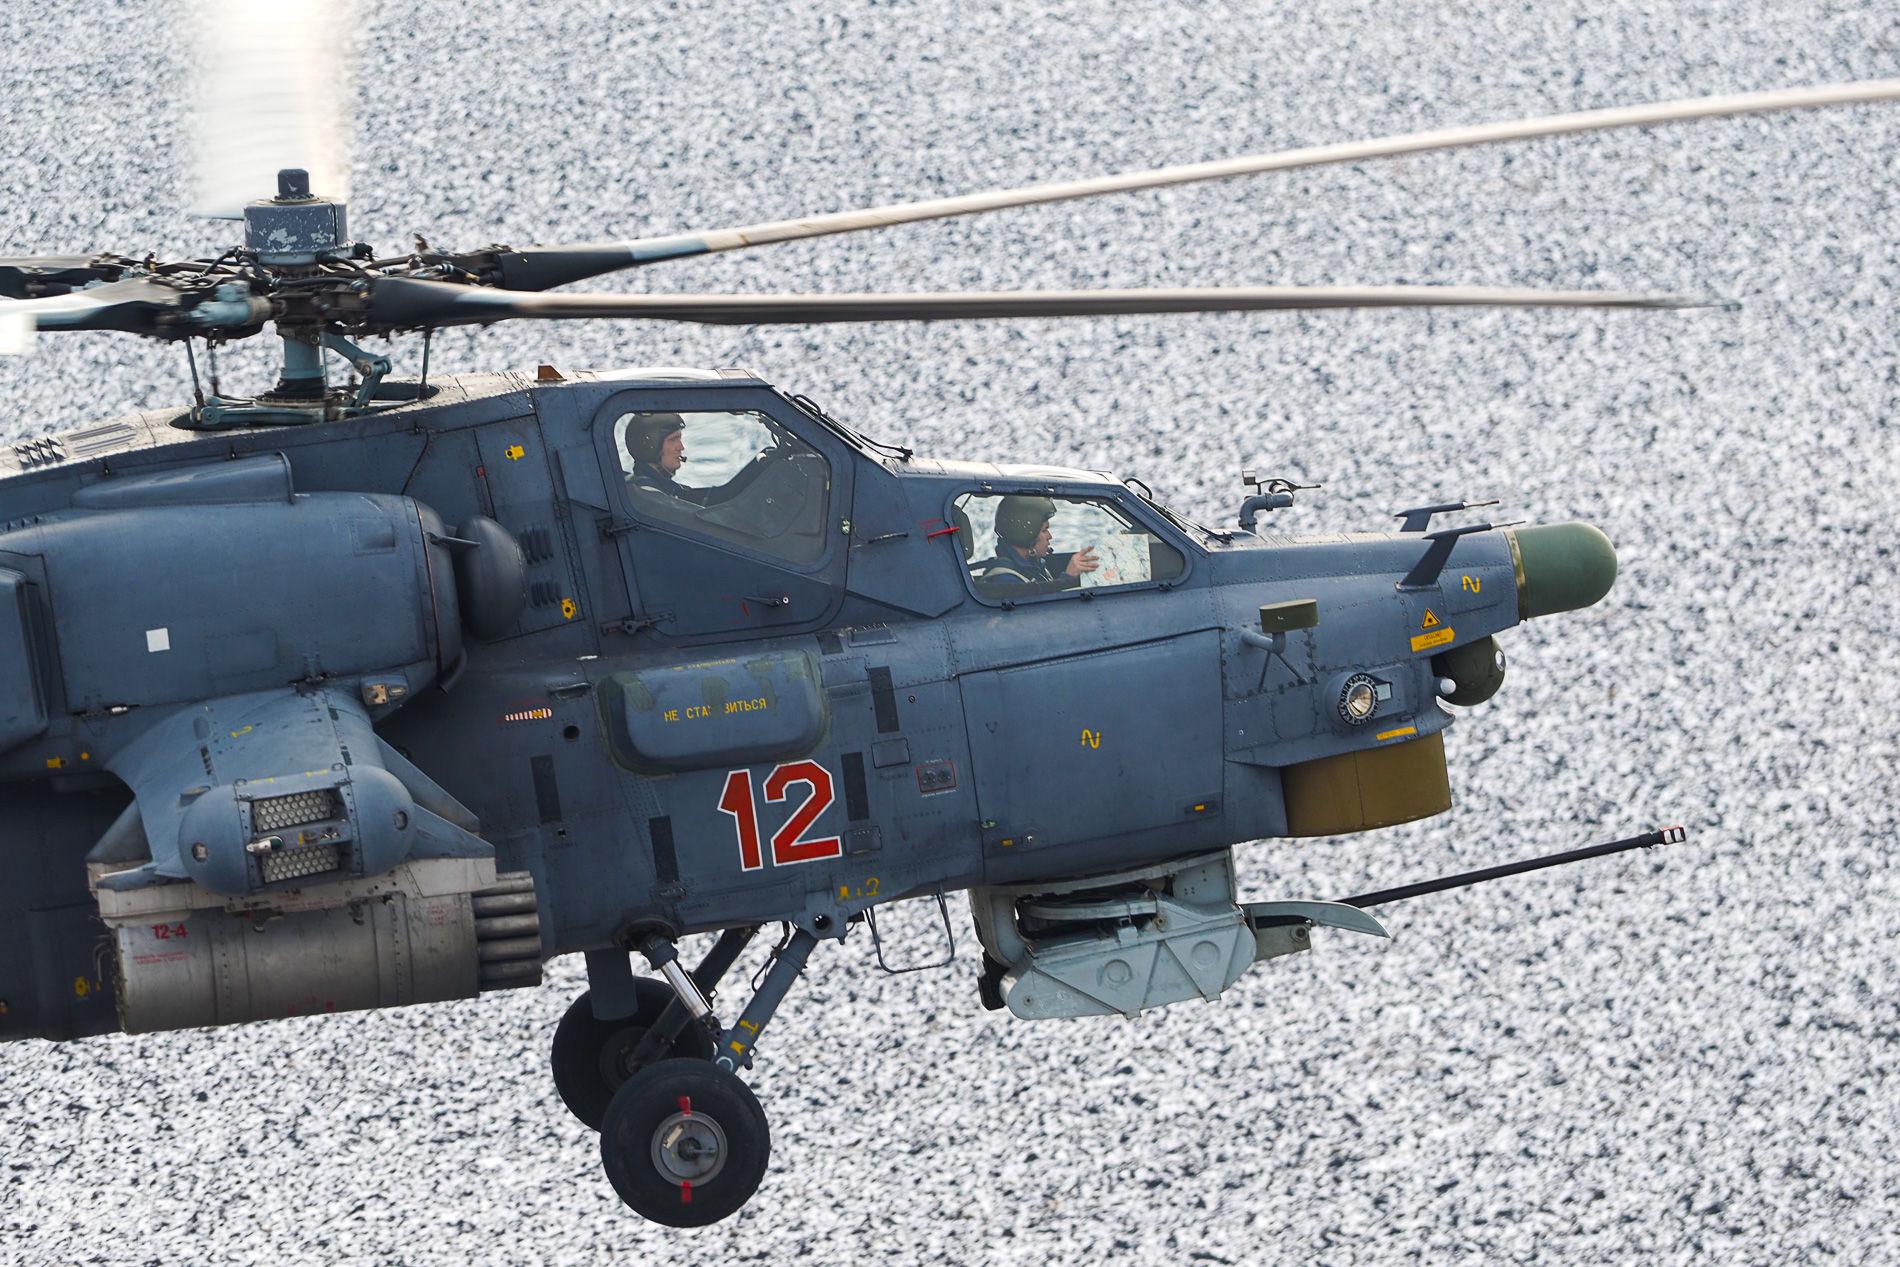 Вертолет Ми-28Н «Ночной охотник» ©Виталий Тимкив, Юга.ру